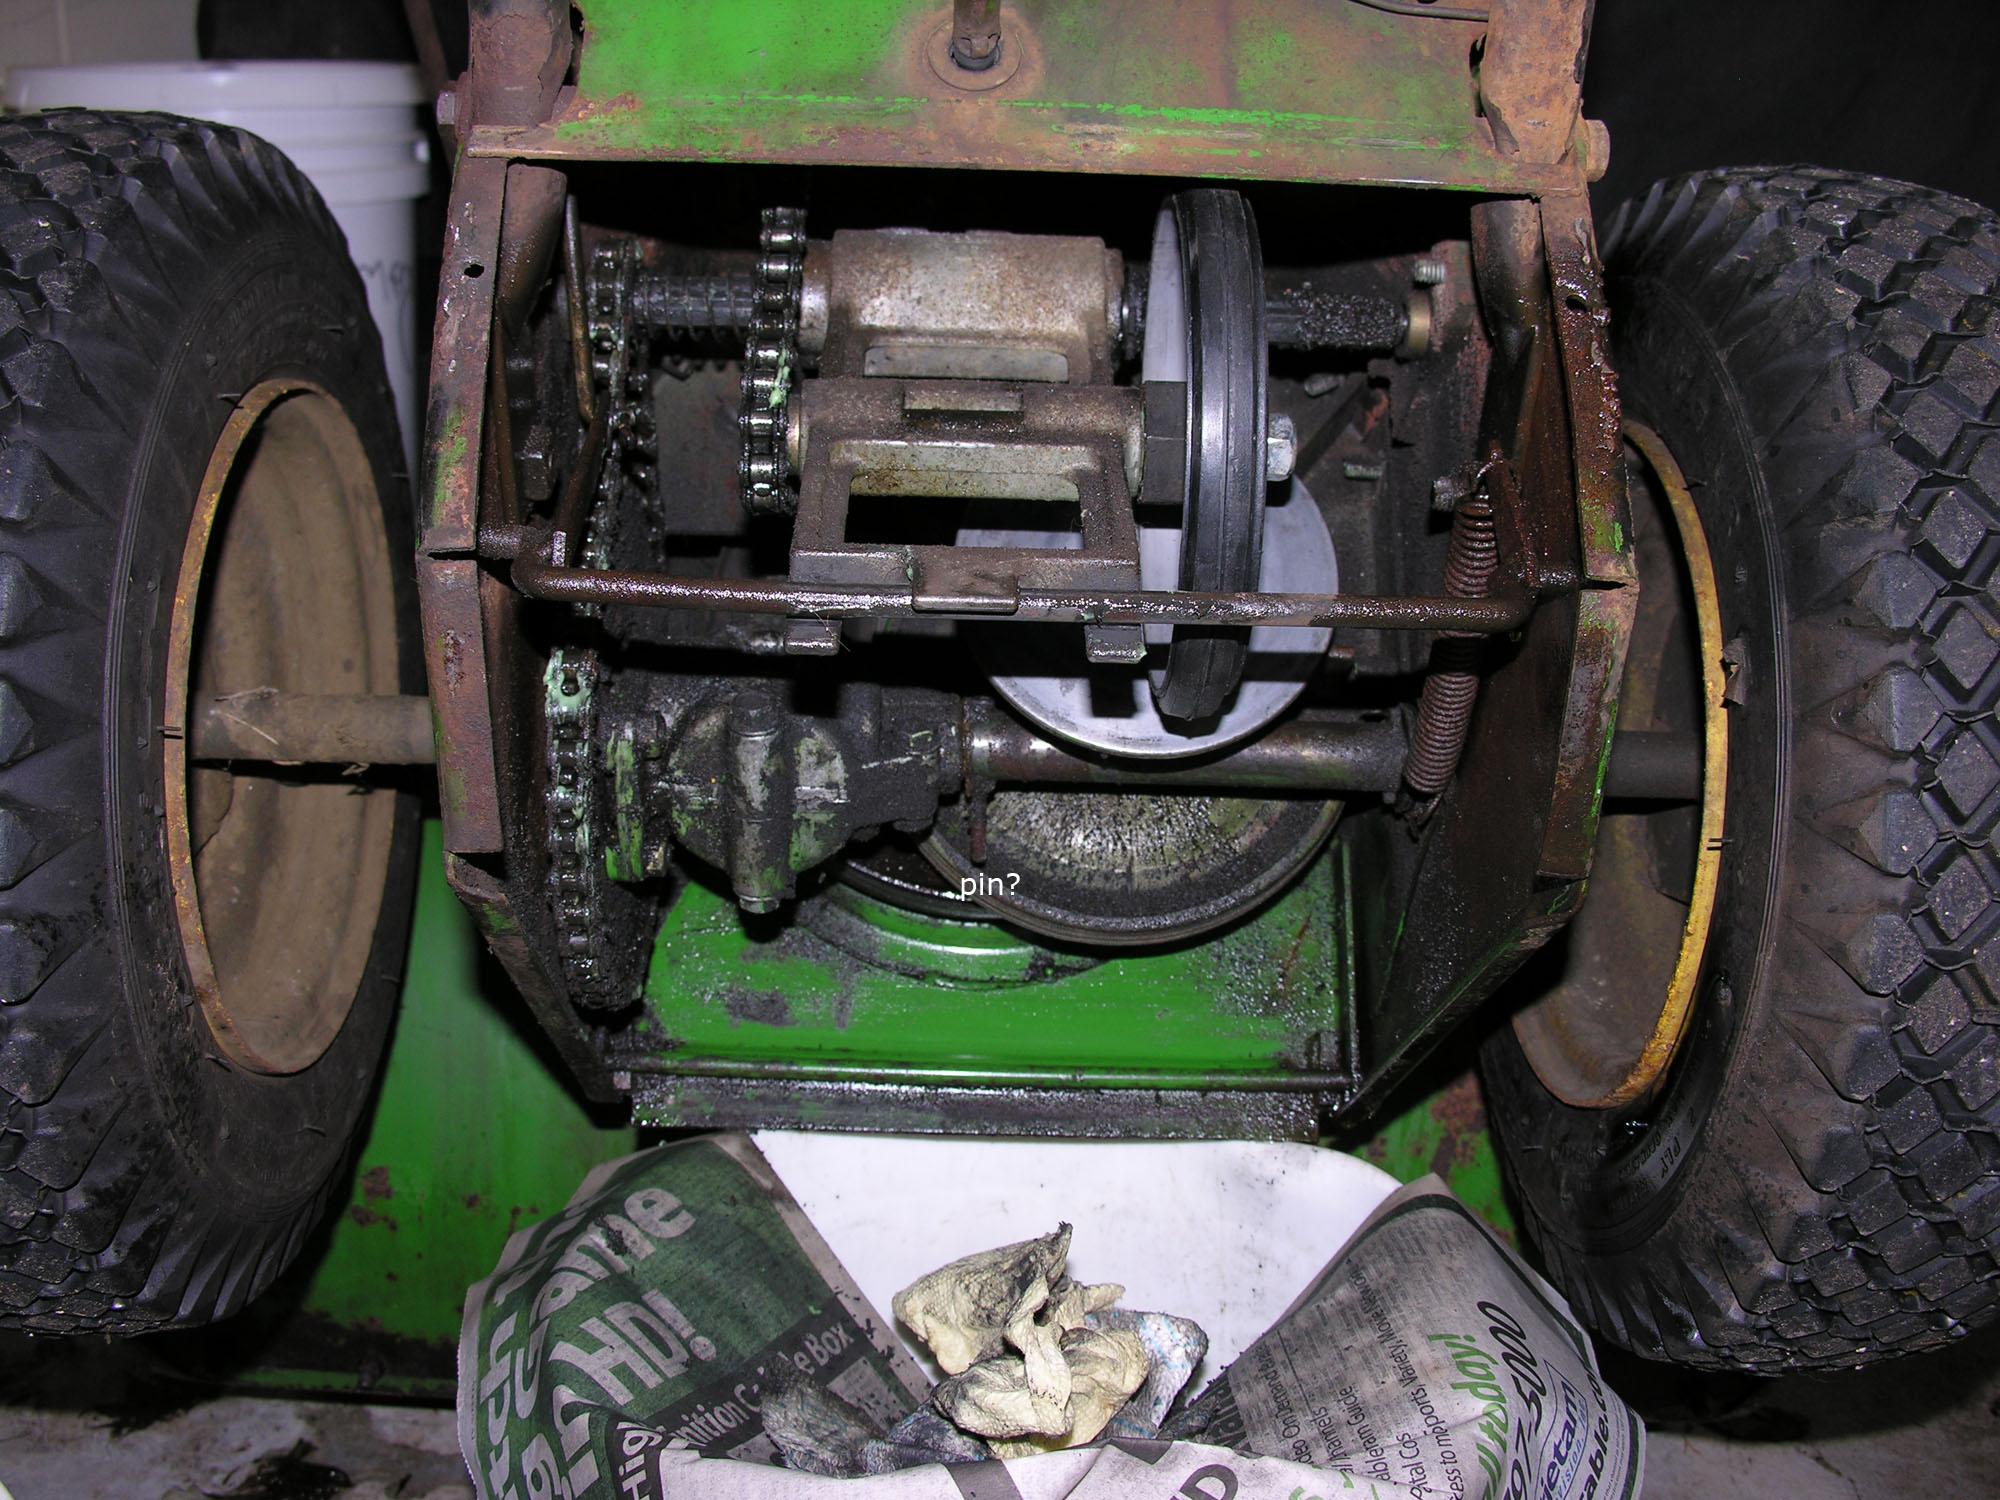 axcel john deere 826 parts  axcel  tractor engine and